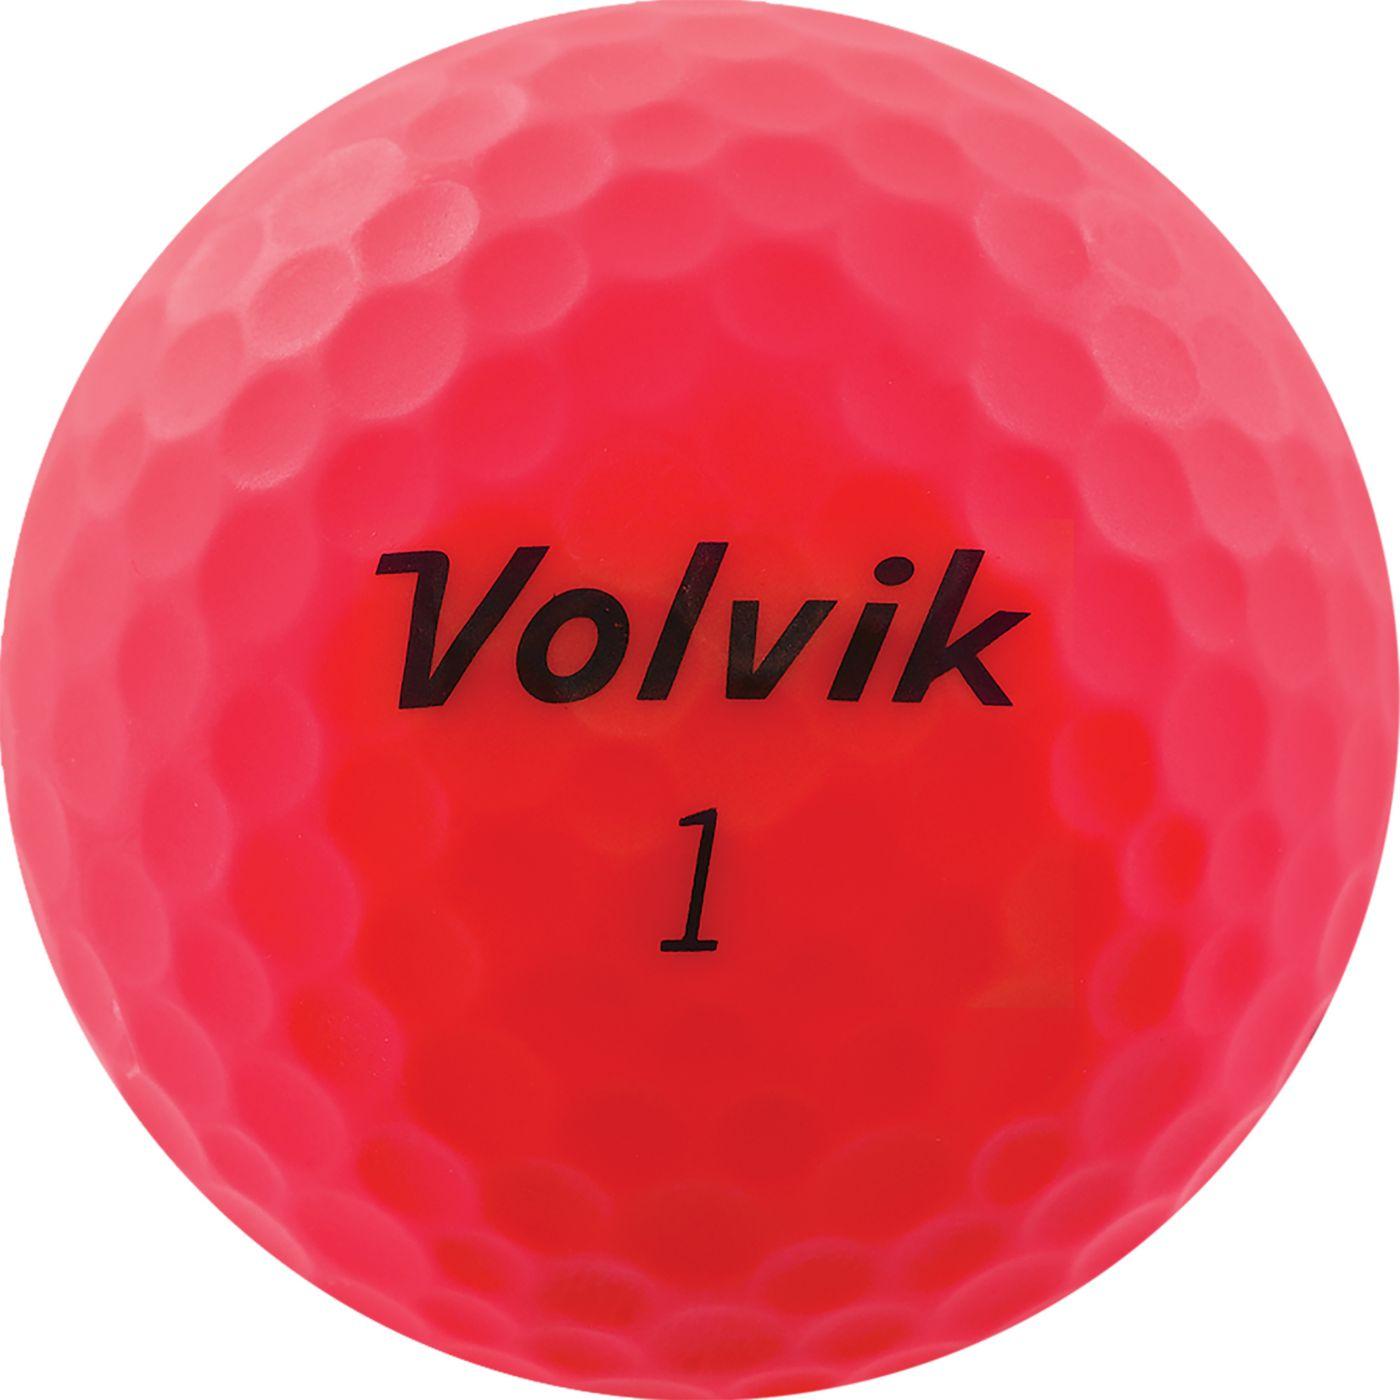 Volvik 2020 VIVID Matte Pink Personalized Golf Balls